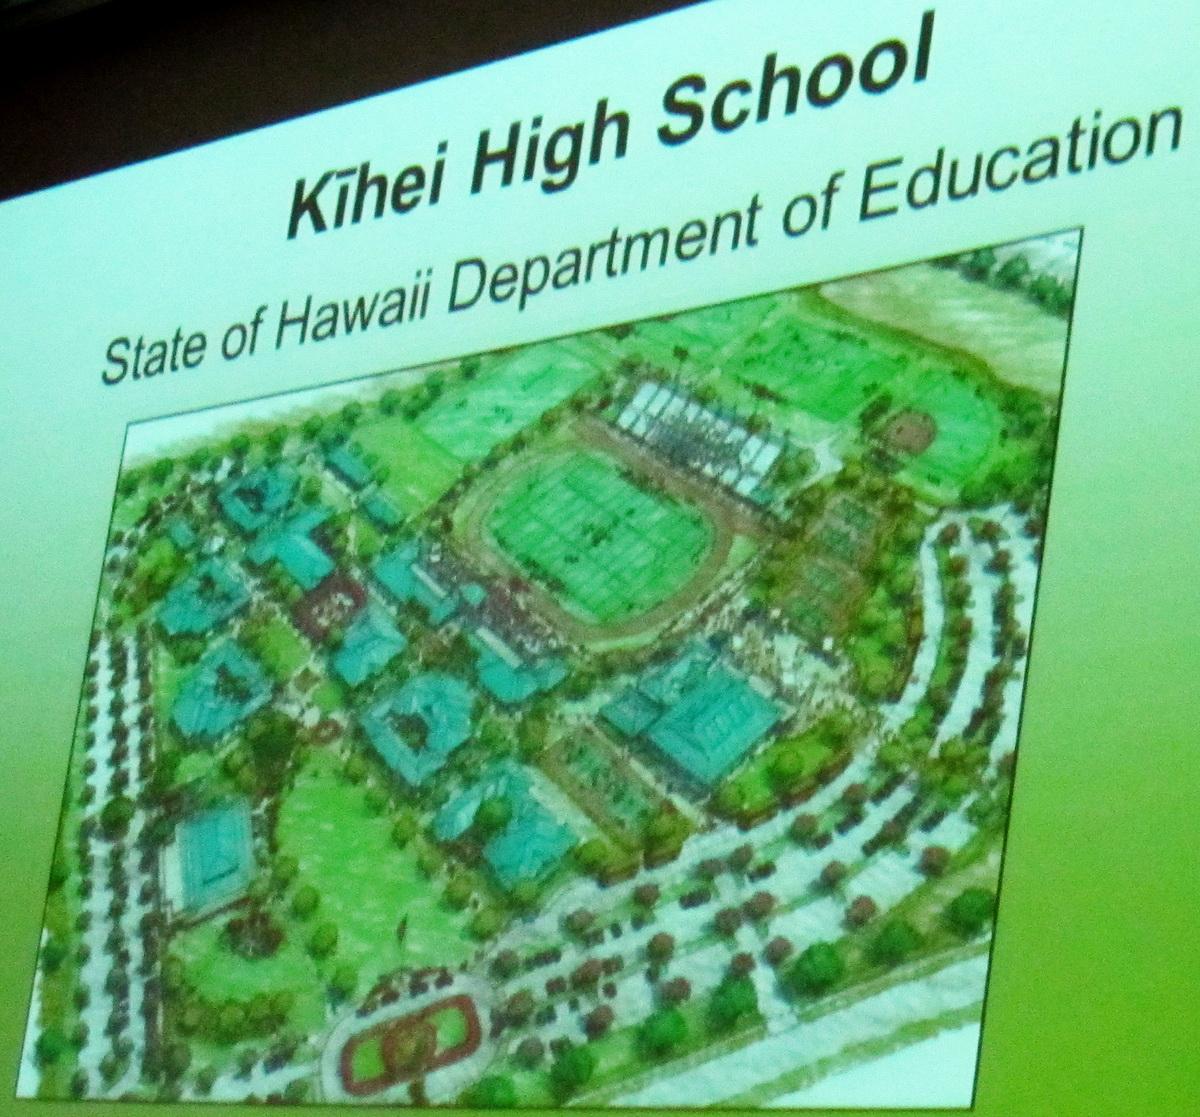 KIHEI HIGH SCHOOL GROUNDBREAKING